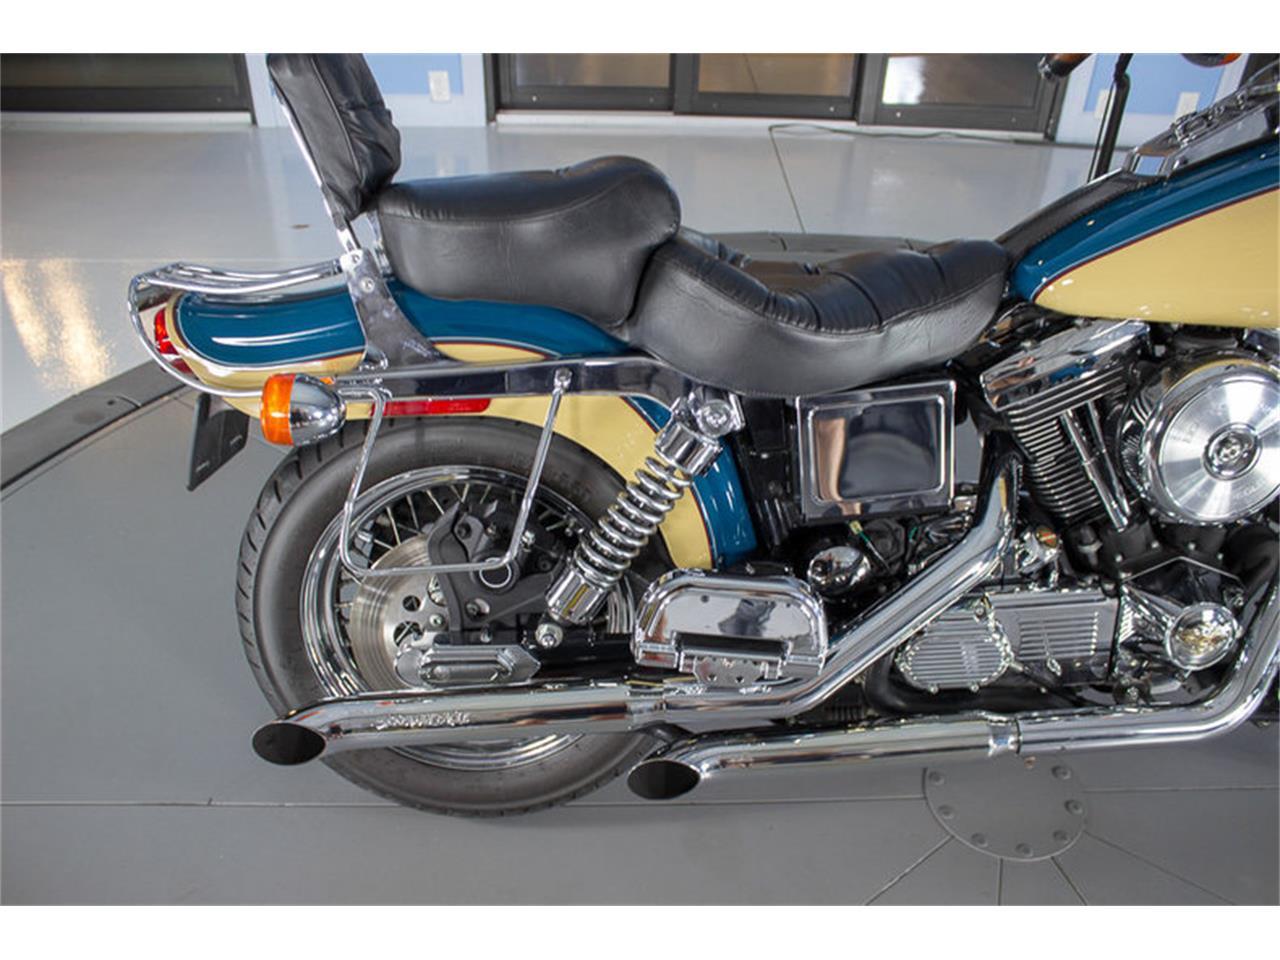 1998 Harley Davidson Dyna Wide Glide Service Manual